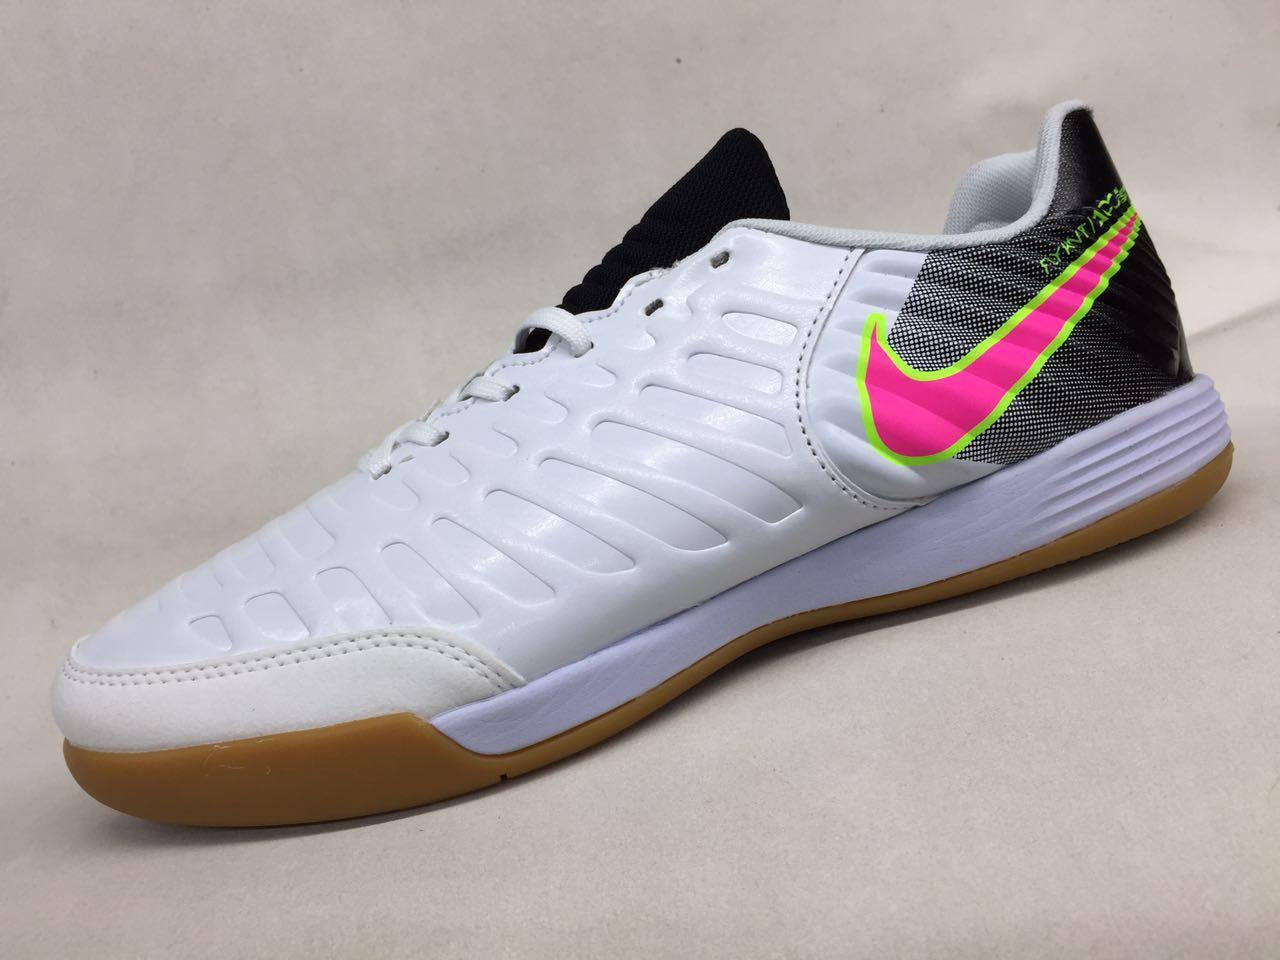 7442e3acee7b61 Футзалки Nike Tiempo 1102 #O/T — в Категории